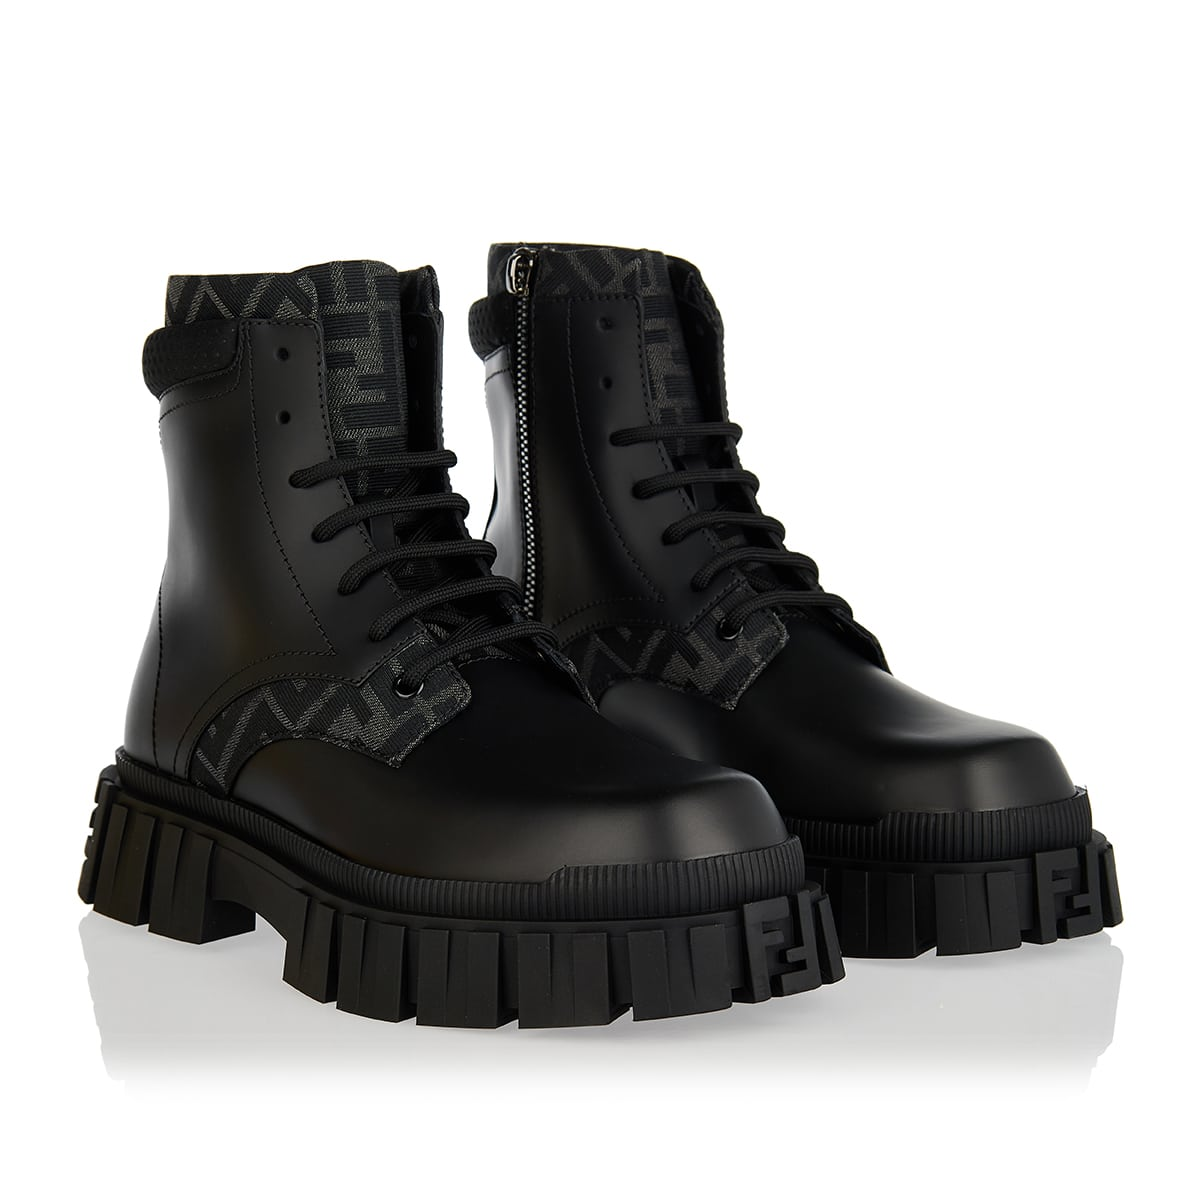 Fendi Force leather combat boots